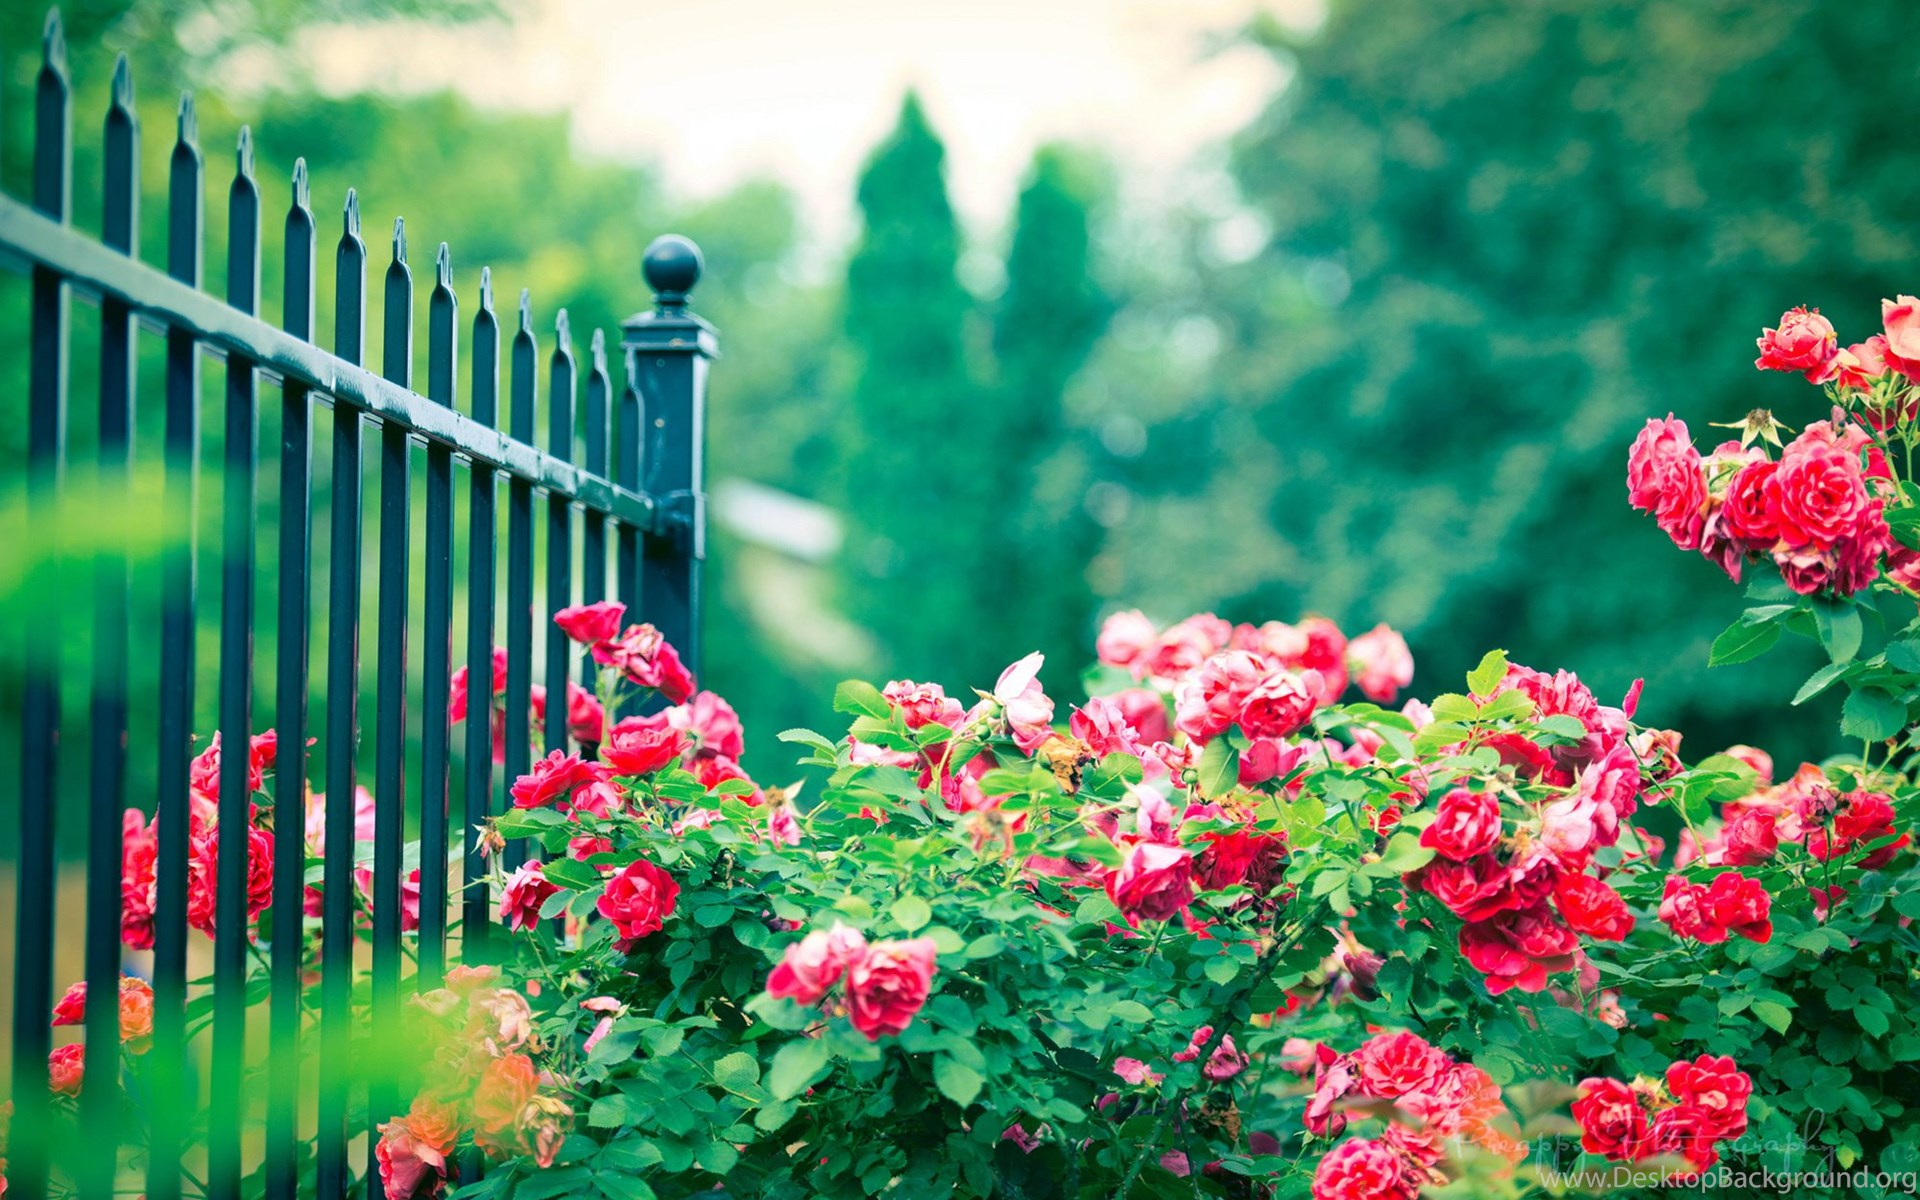 Hd Wallpapers Nature Flowers Rose 6 Jpg Desktop Background